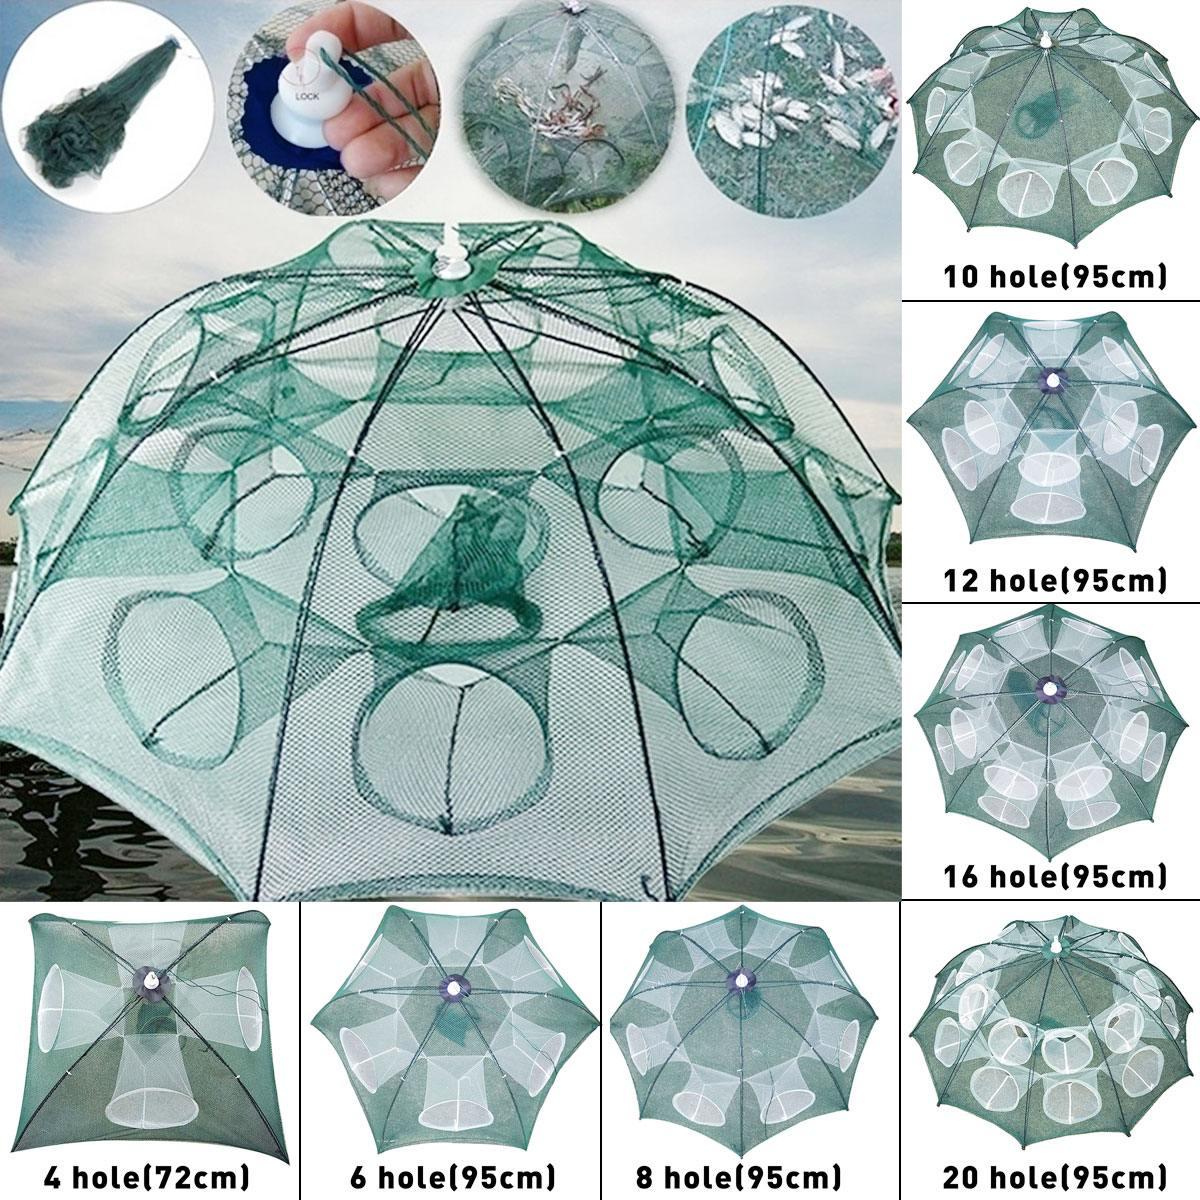 Foldable Fishing Net Shrimp Cage Crab Fish Cast Mesh Trap 8 Sides 8 Holes